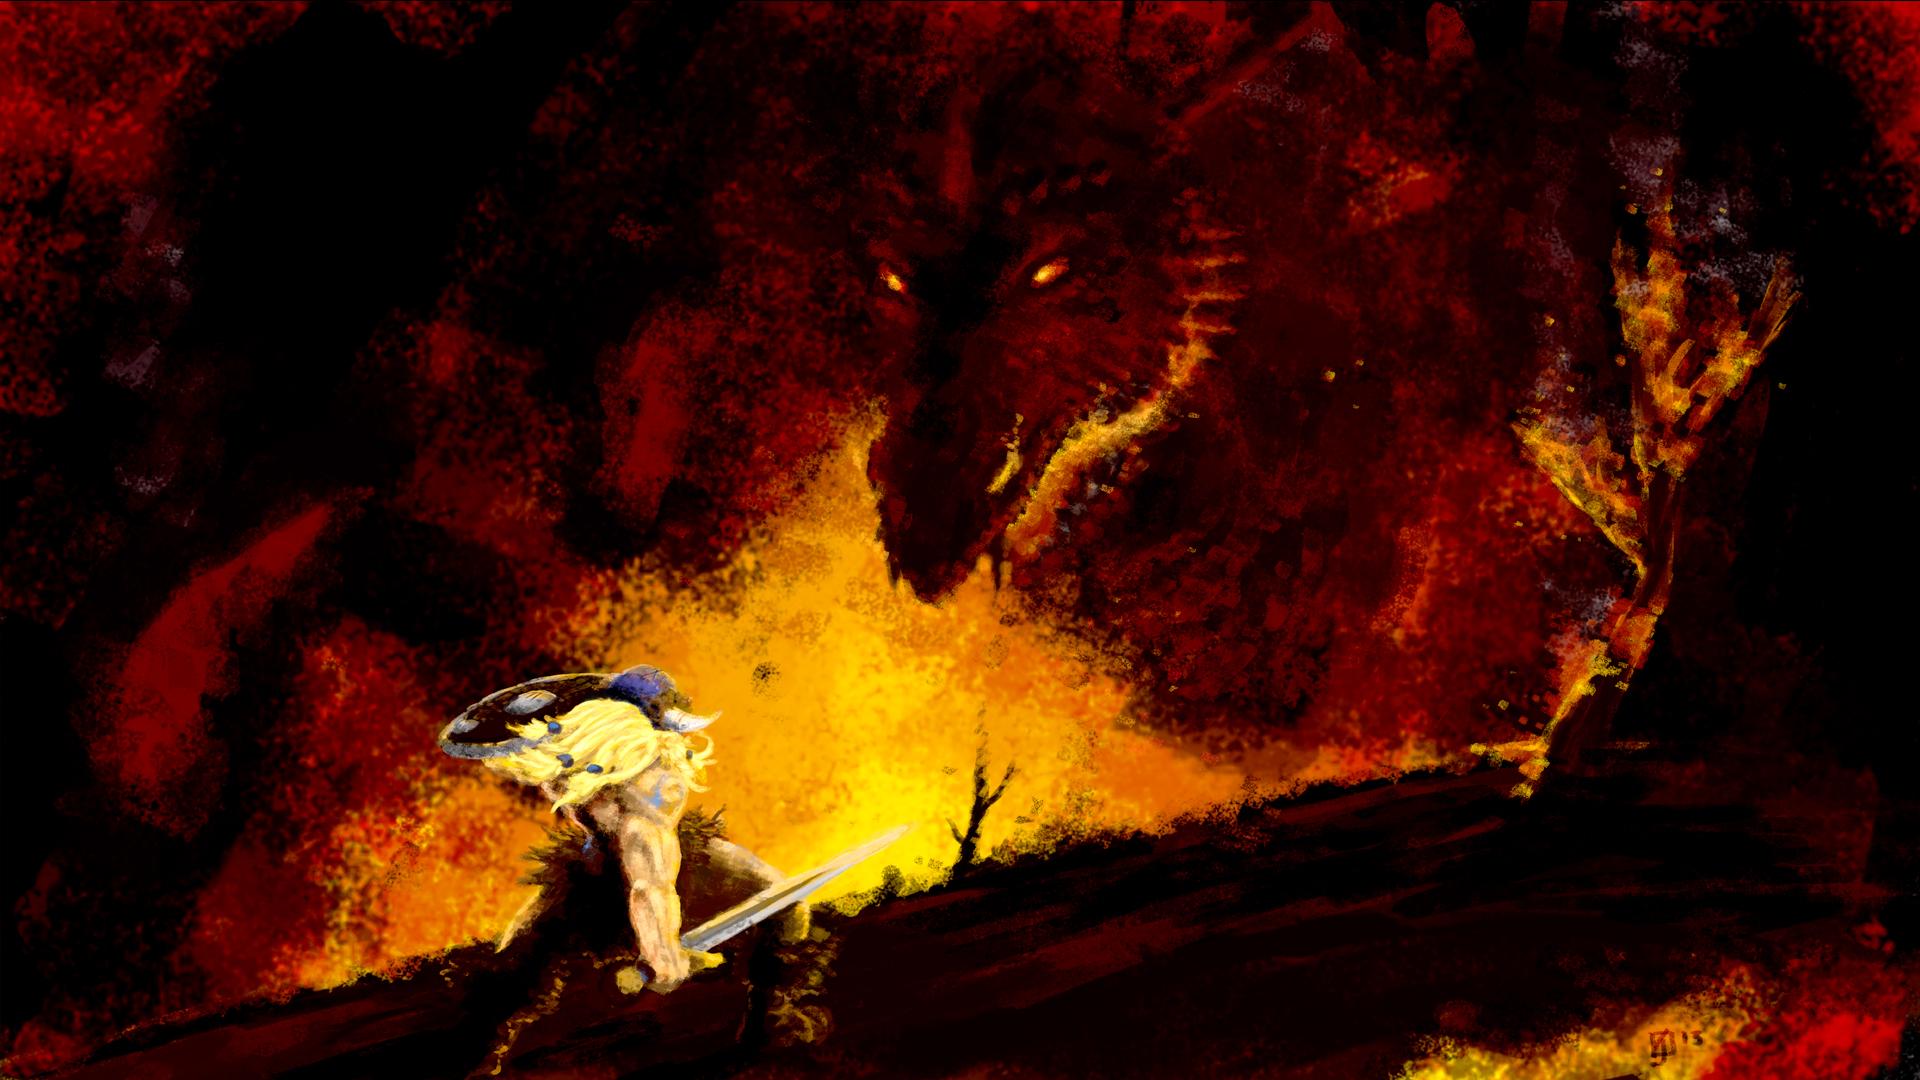 nidhogg the imprisoned dragon